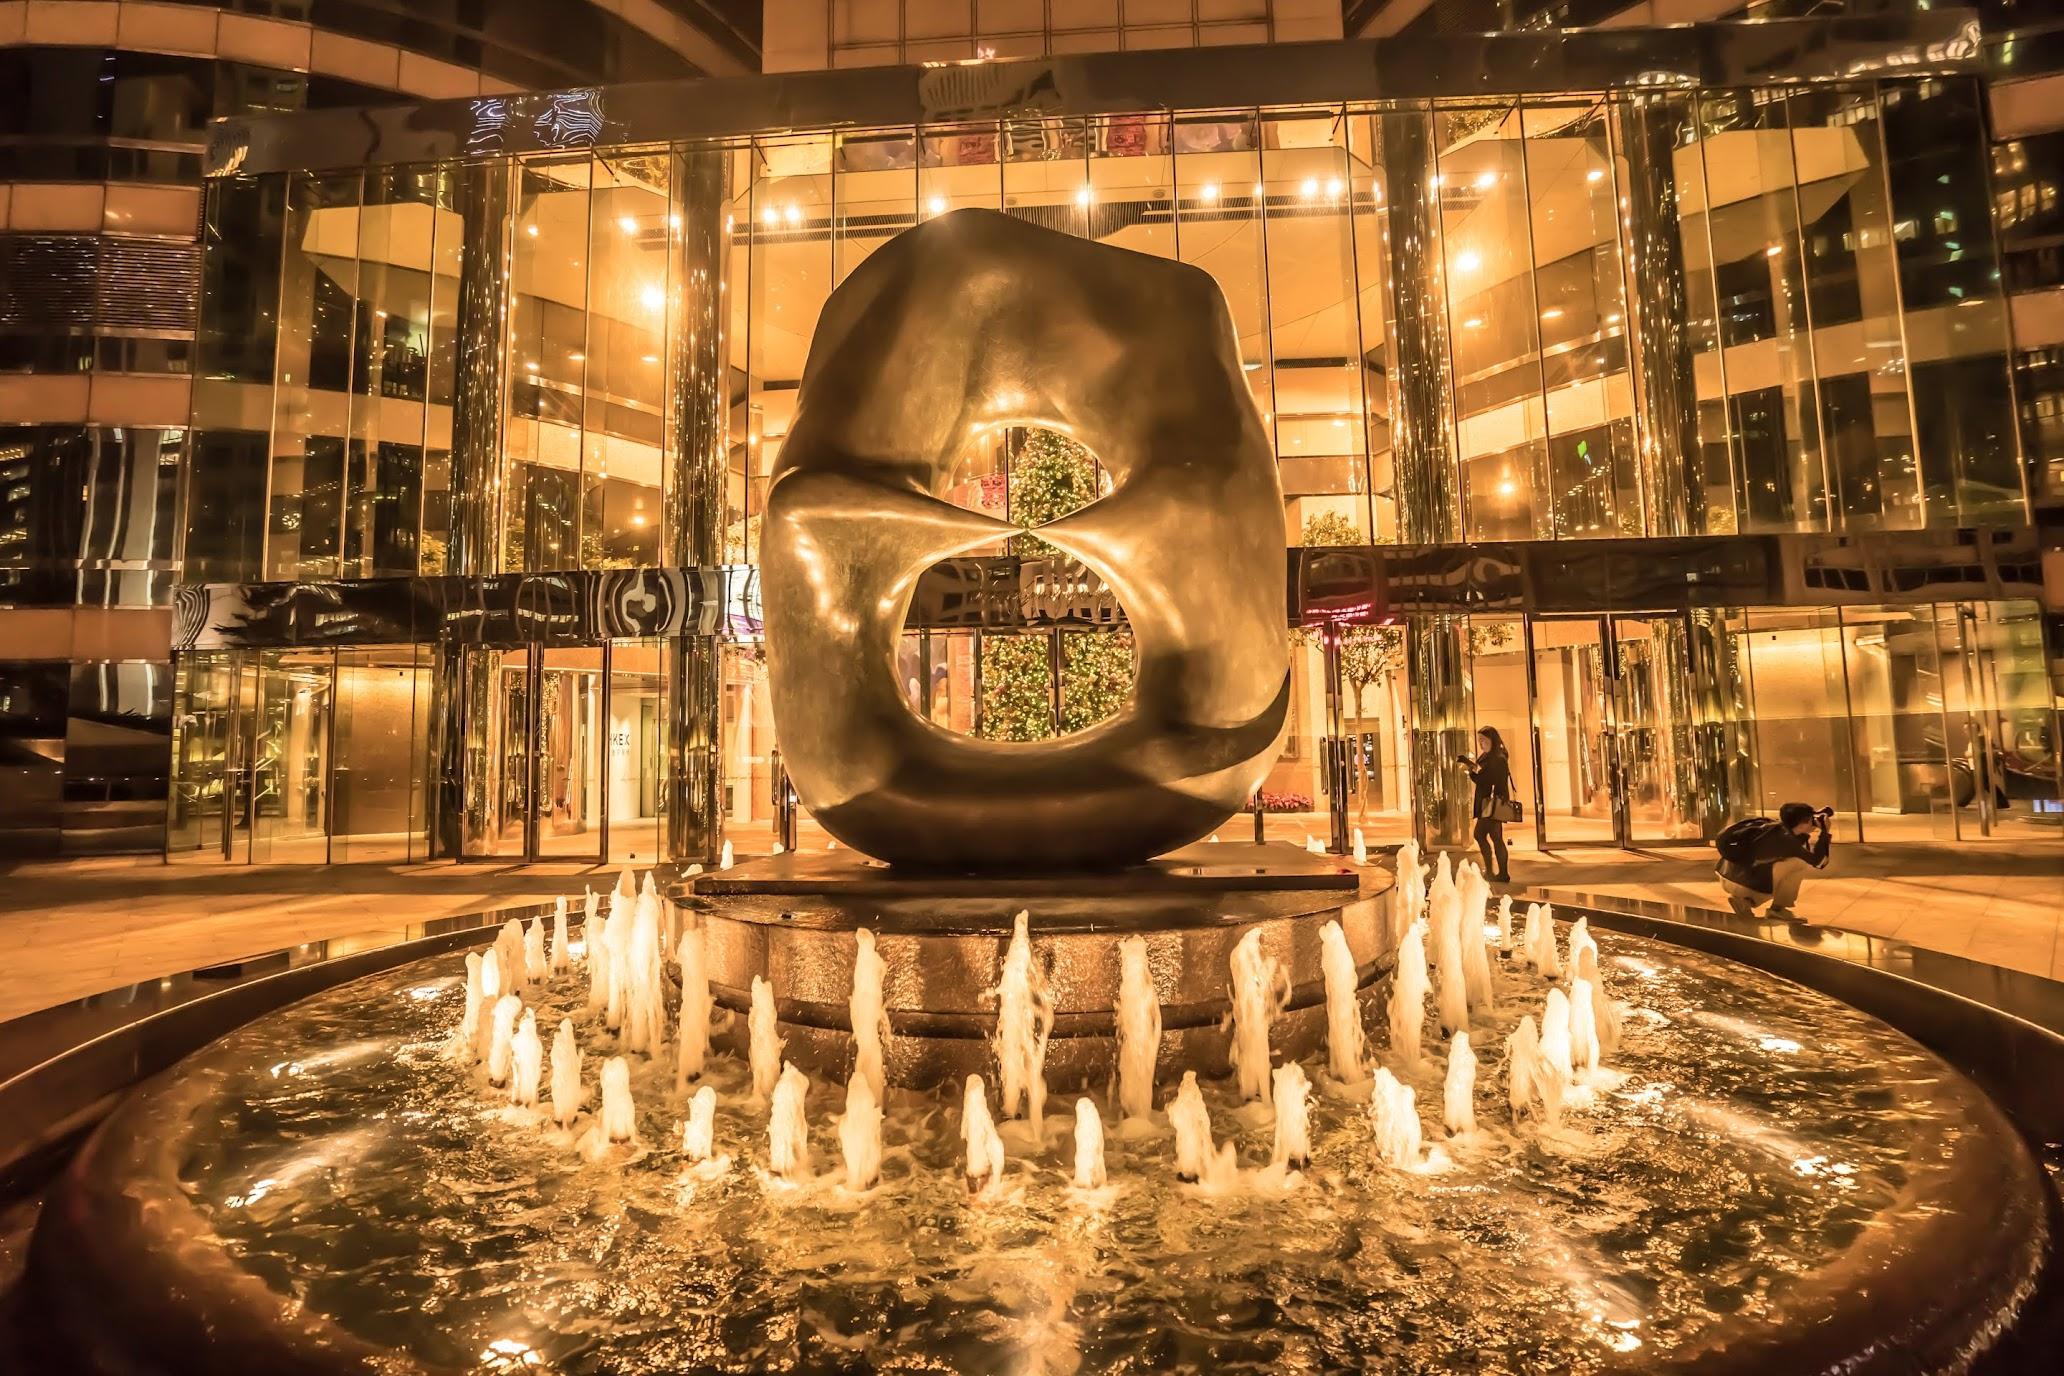 Hong Kong IFC mall Night view1